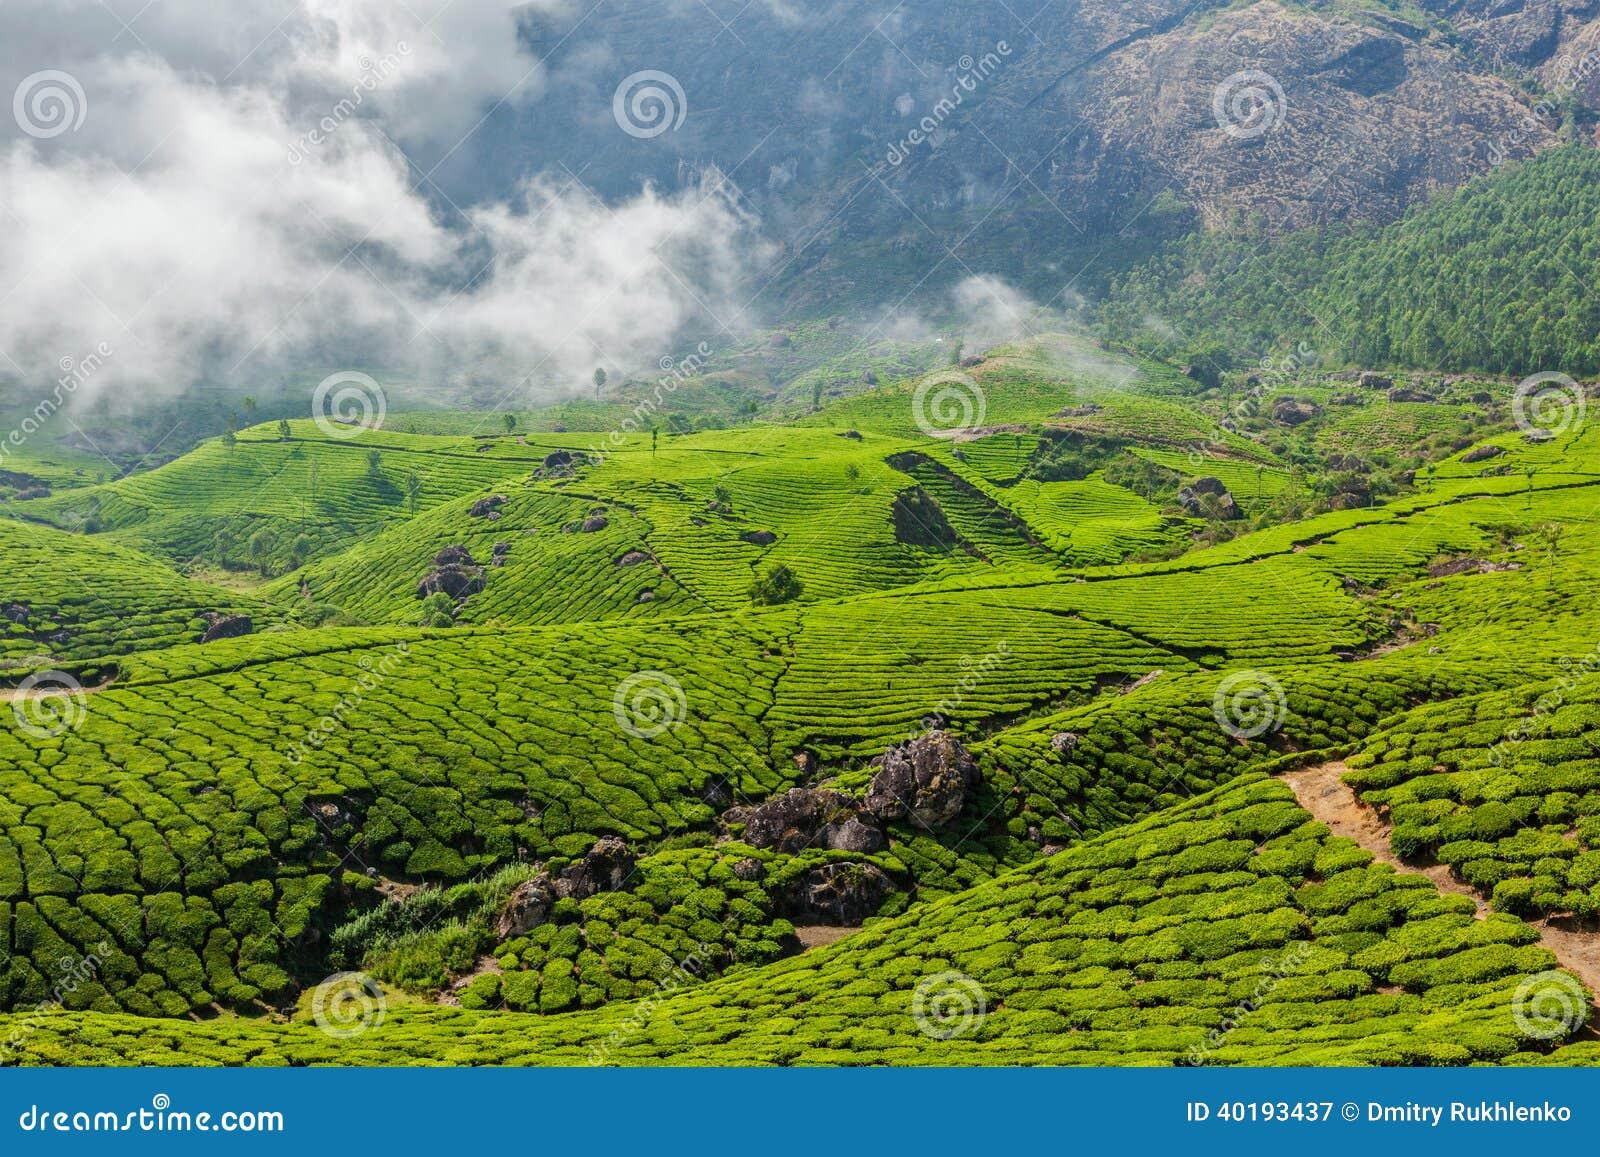 Green Tea Plantations In Munnar, Kerala, India Stock Photo ...